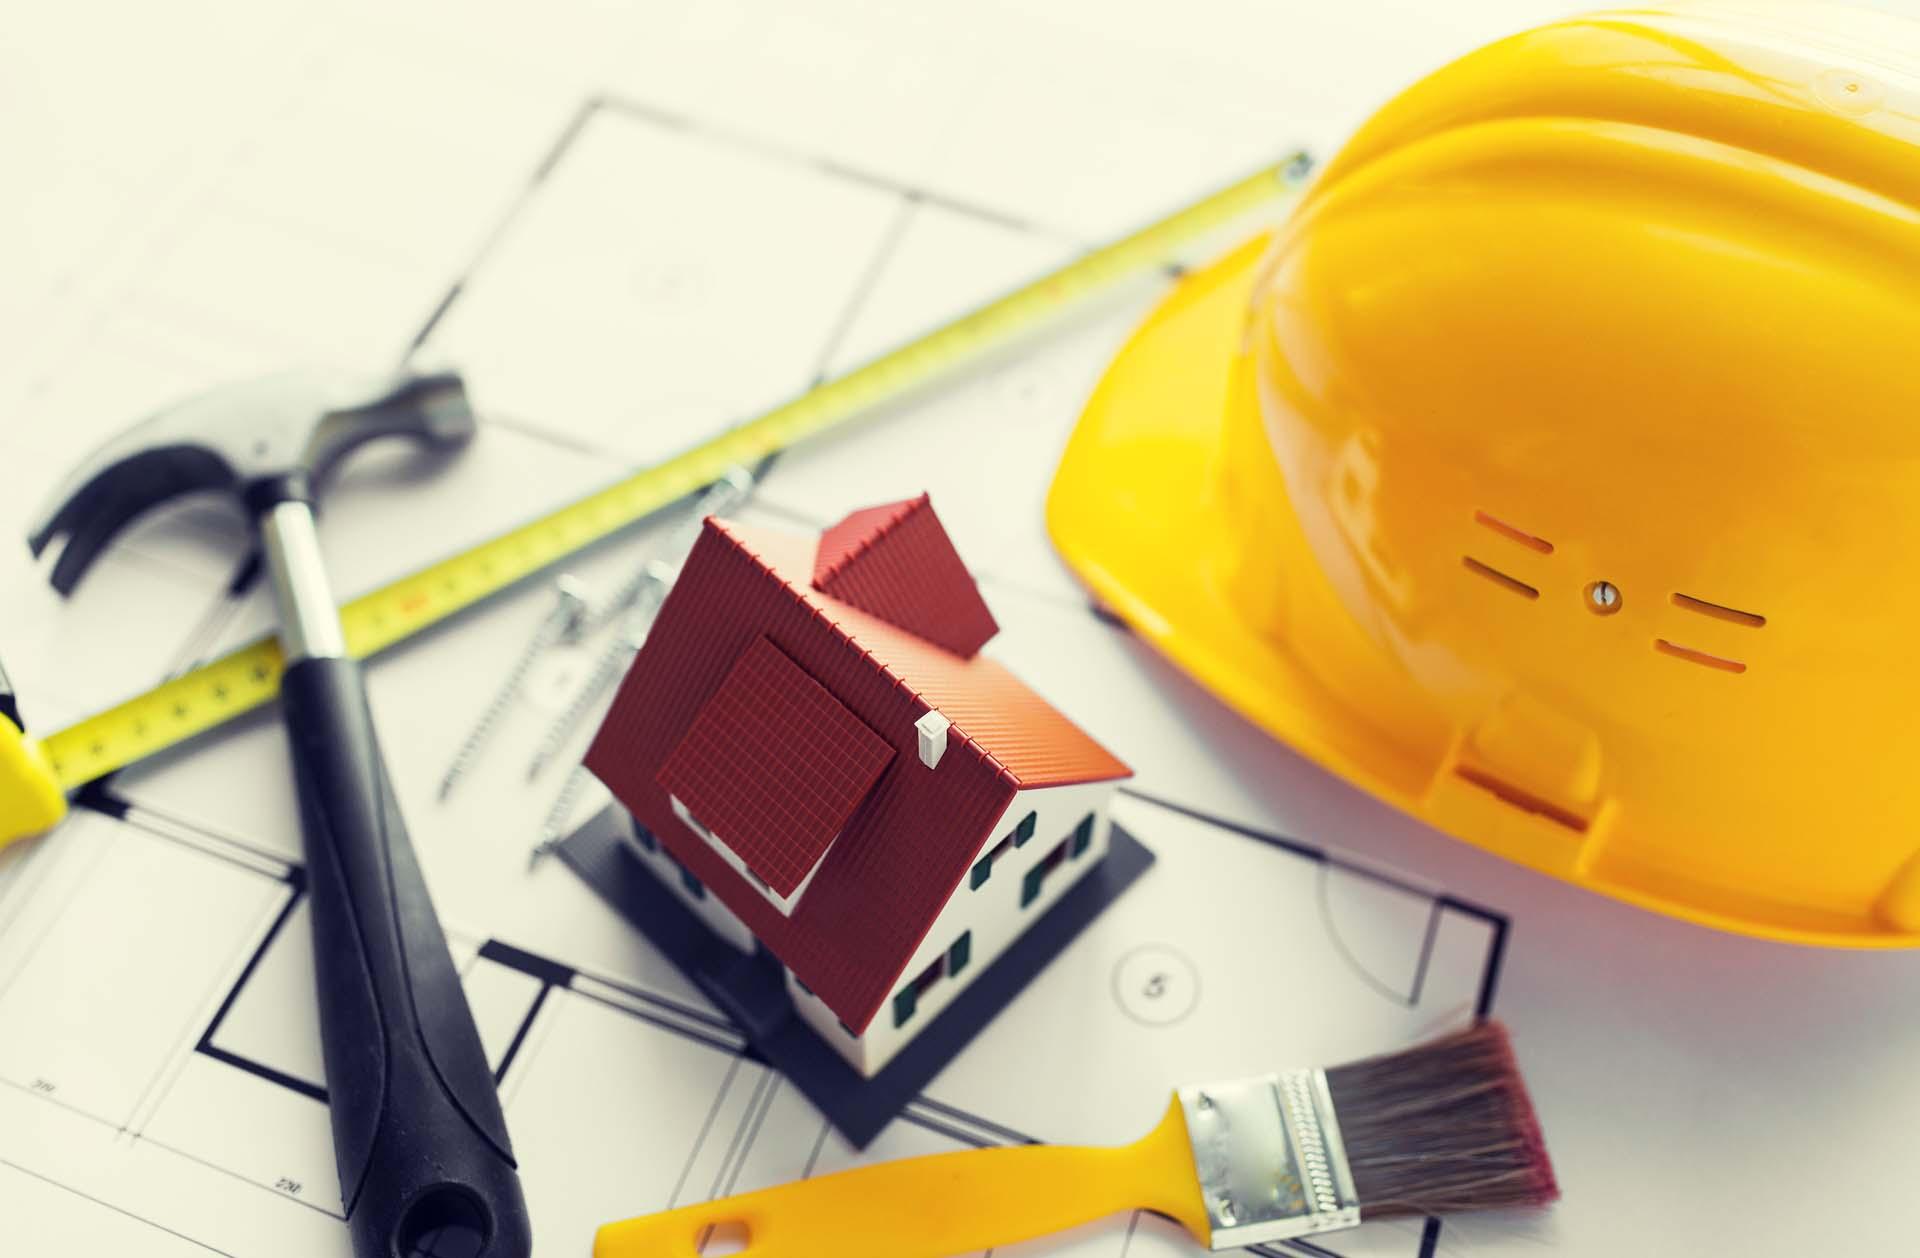 Hausbau Pläne